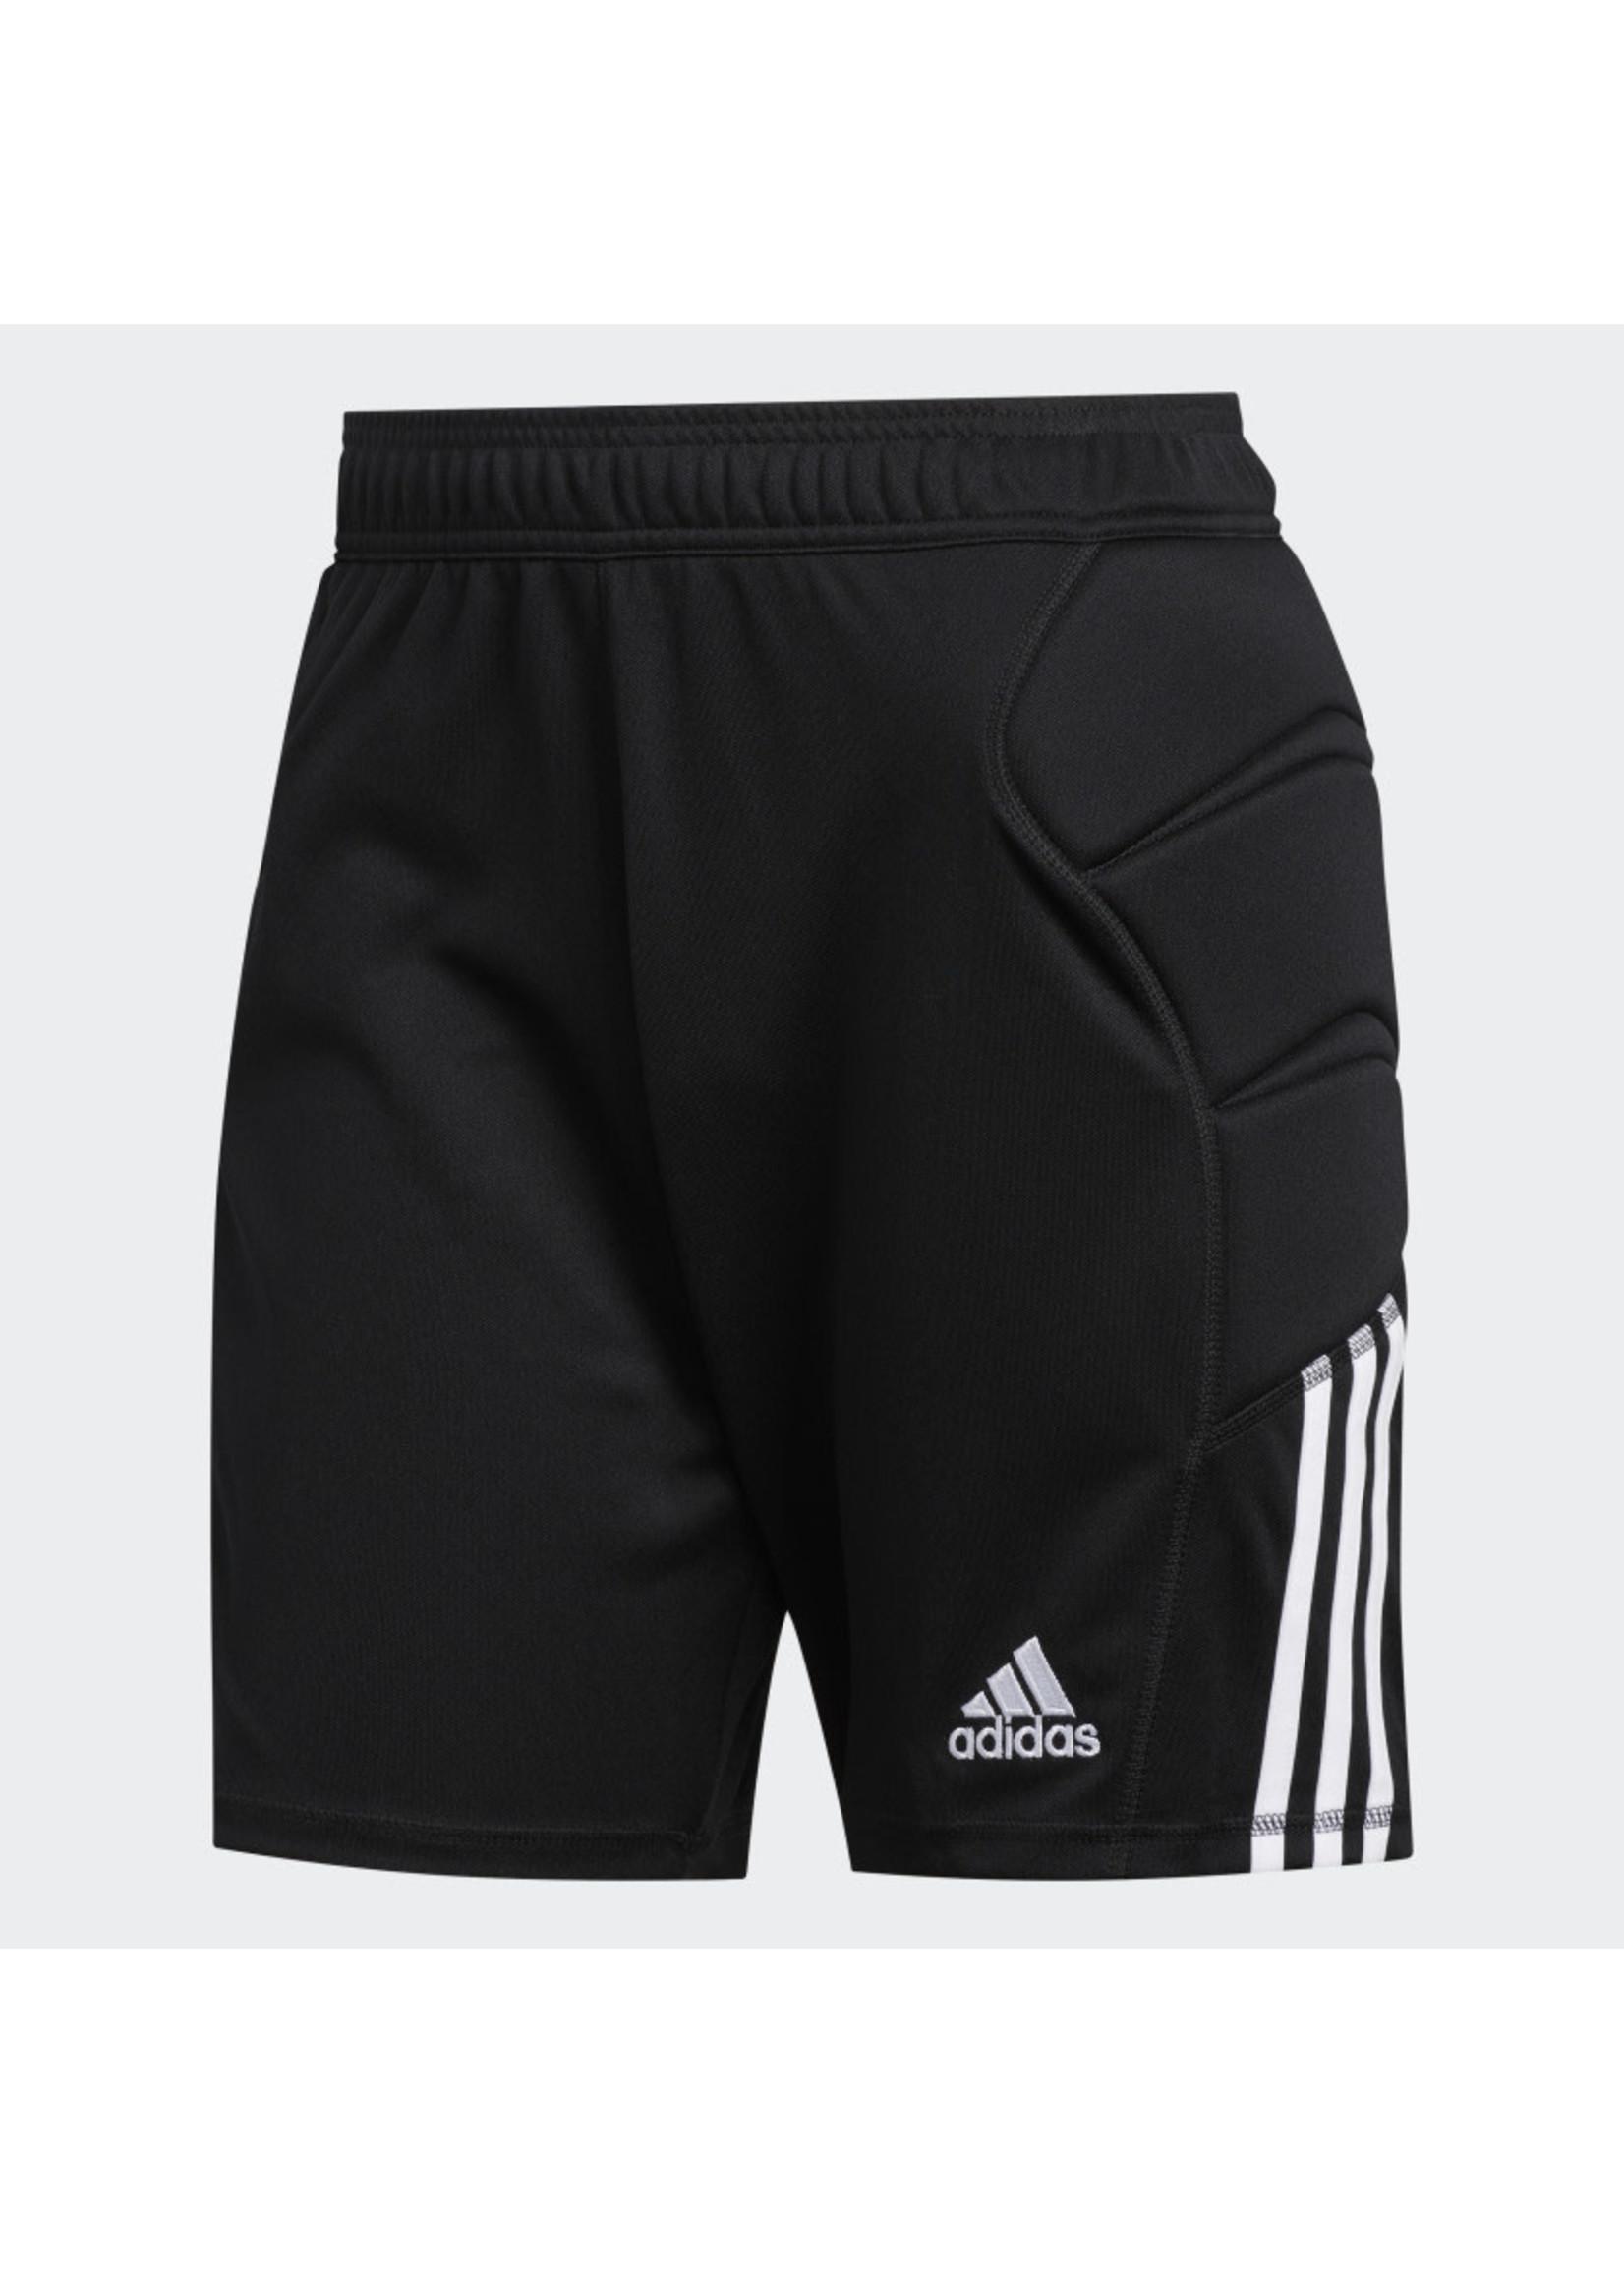 Adidas TIERRO GK SHORT